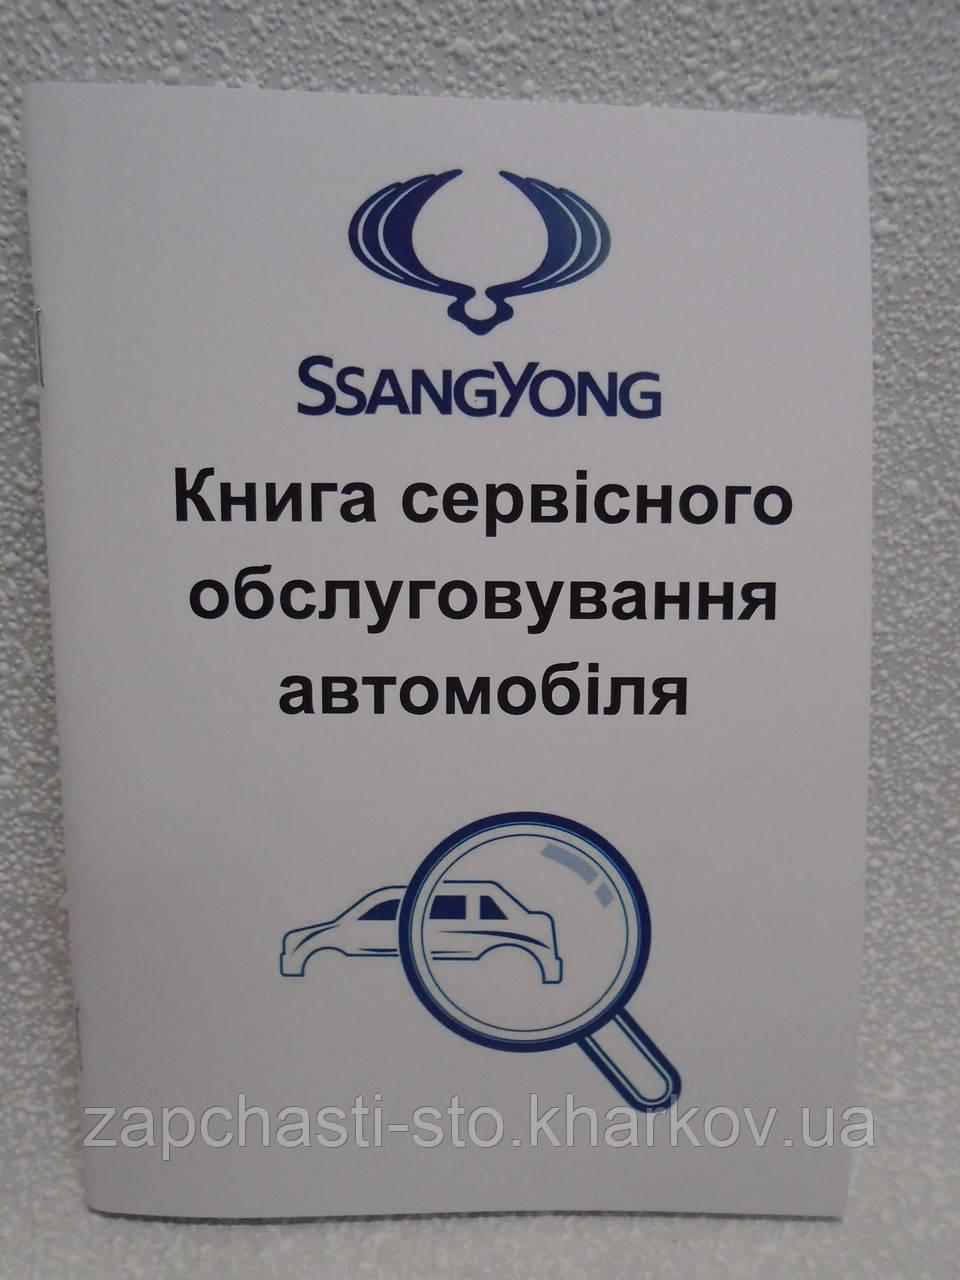 Сервисная книга автомобиля Ssang Yong